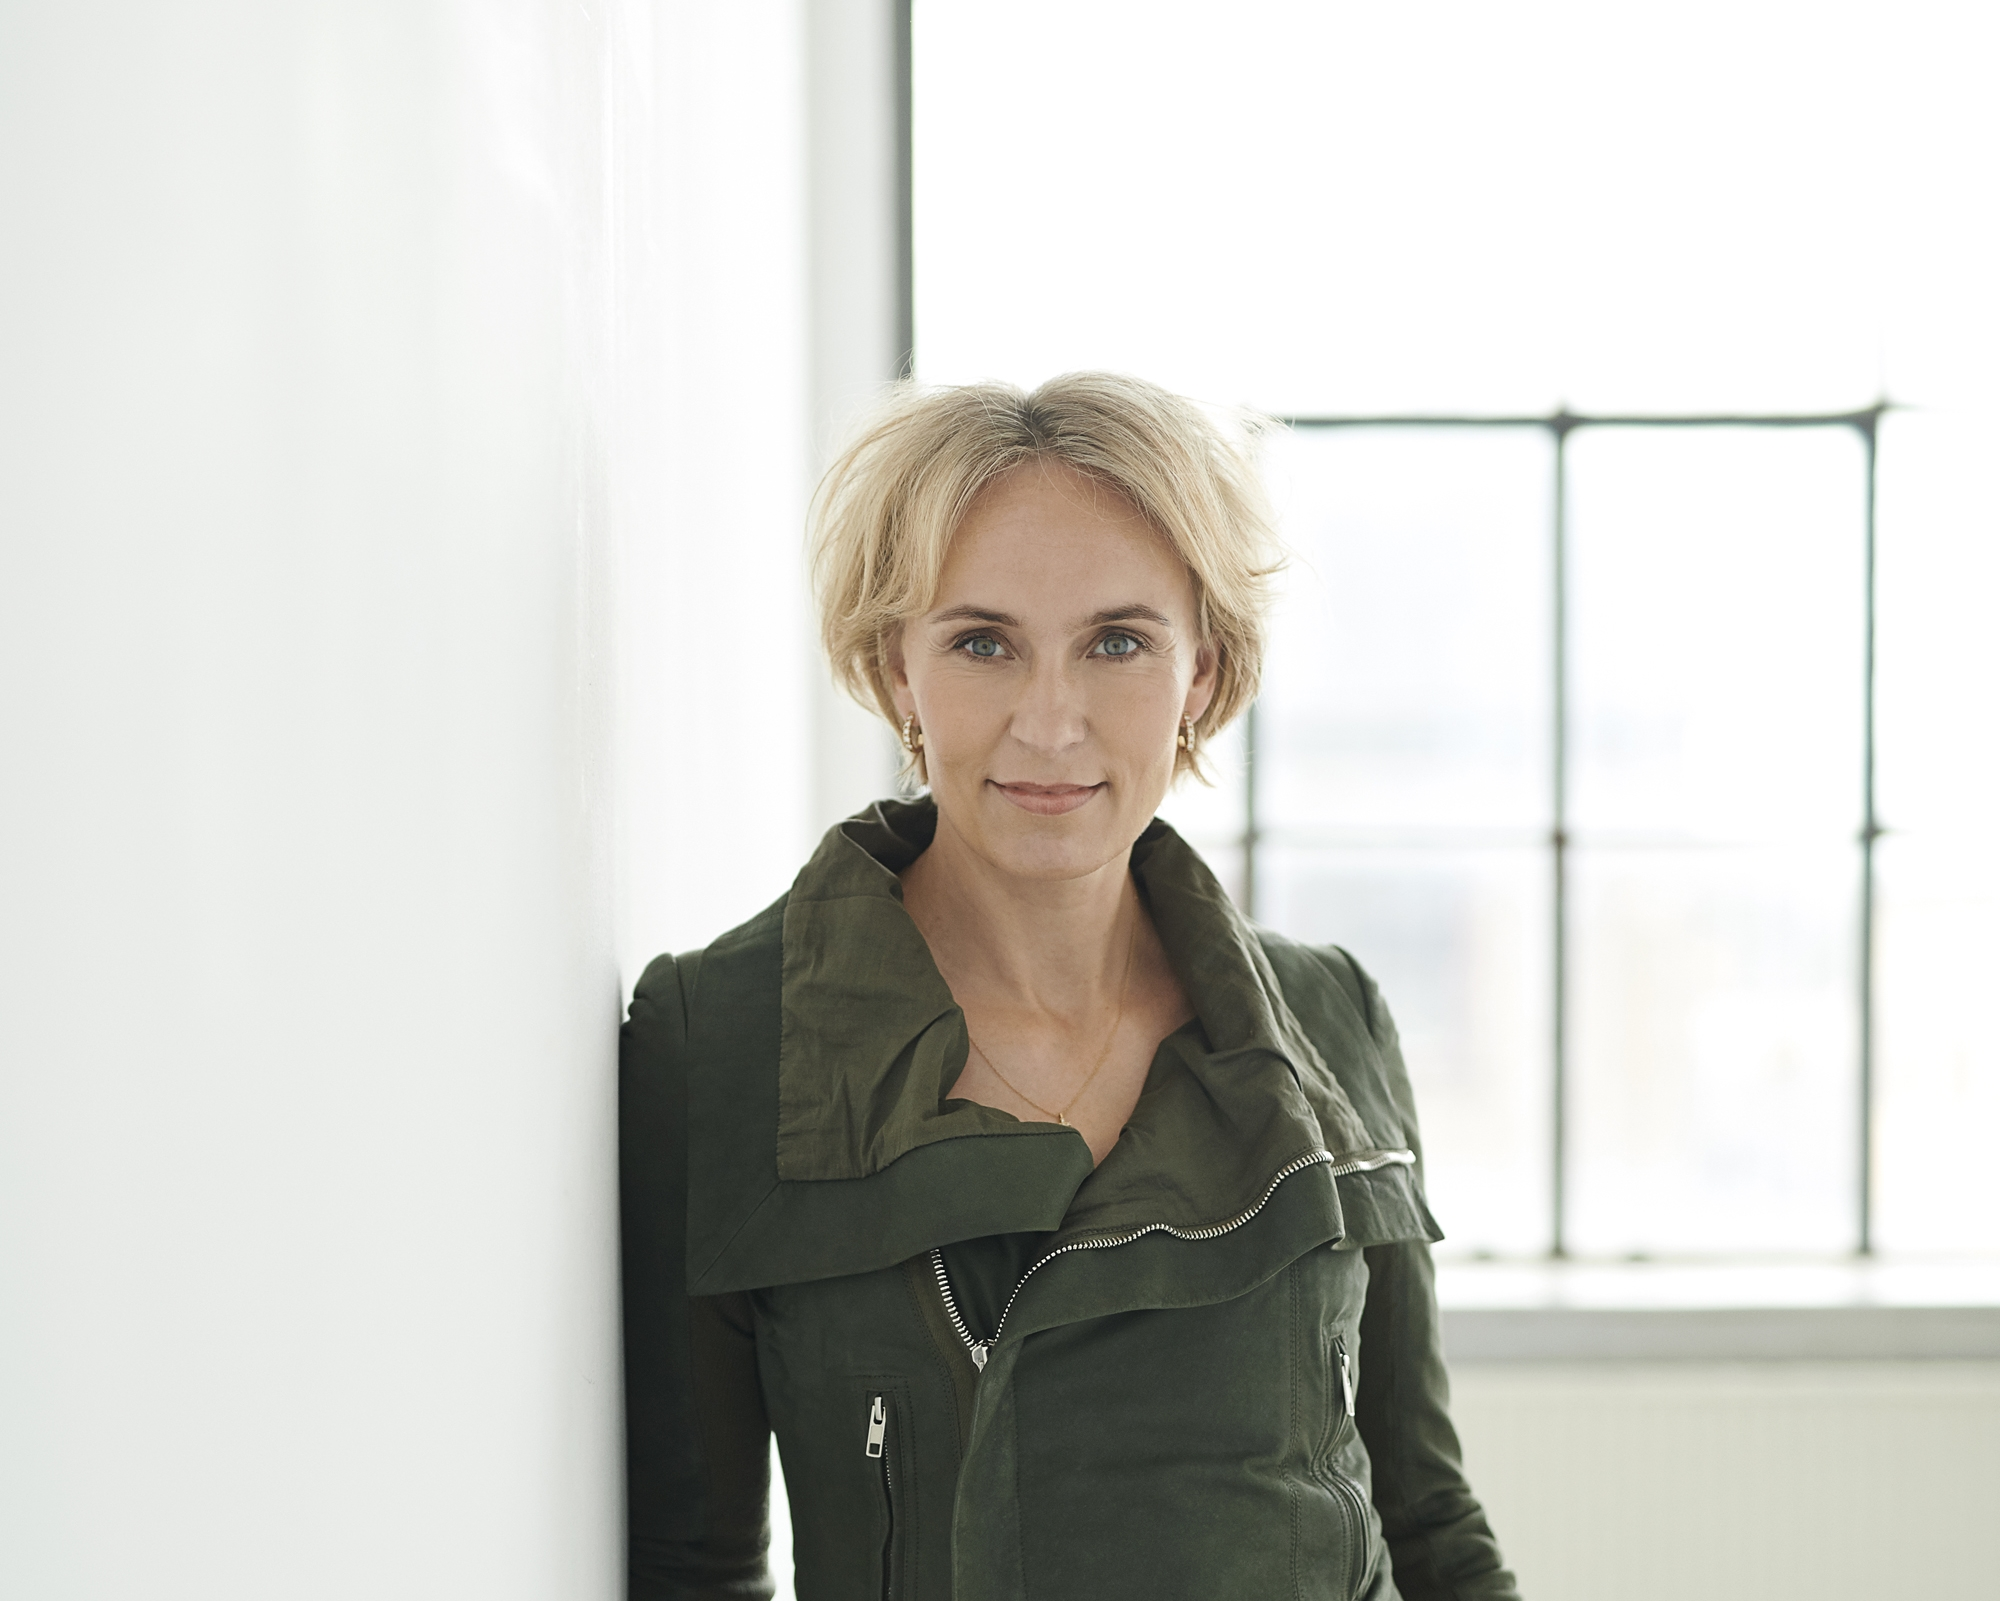 Susanne Mørck Koch afløser senest 1. september Lars Liebst som administrerende direktør i Tivoli. Foto: Ricky John Molloy.